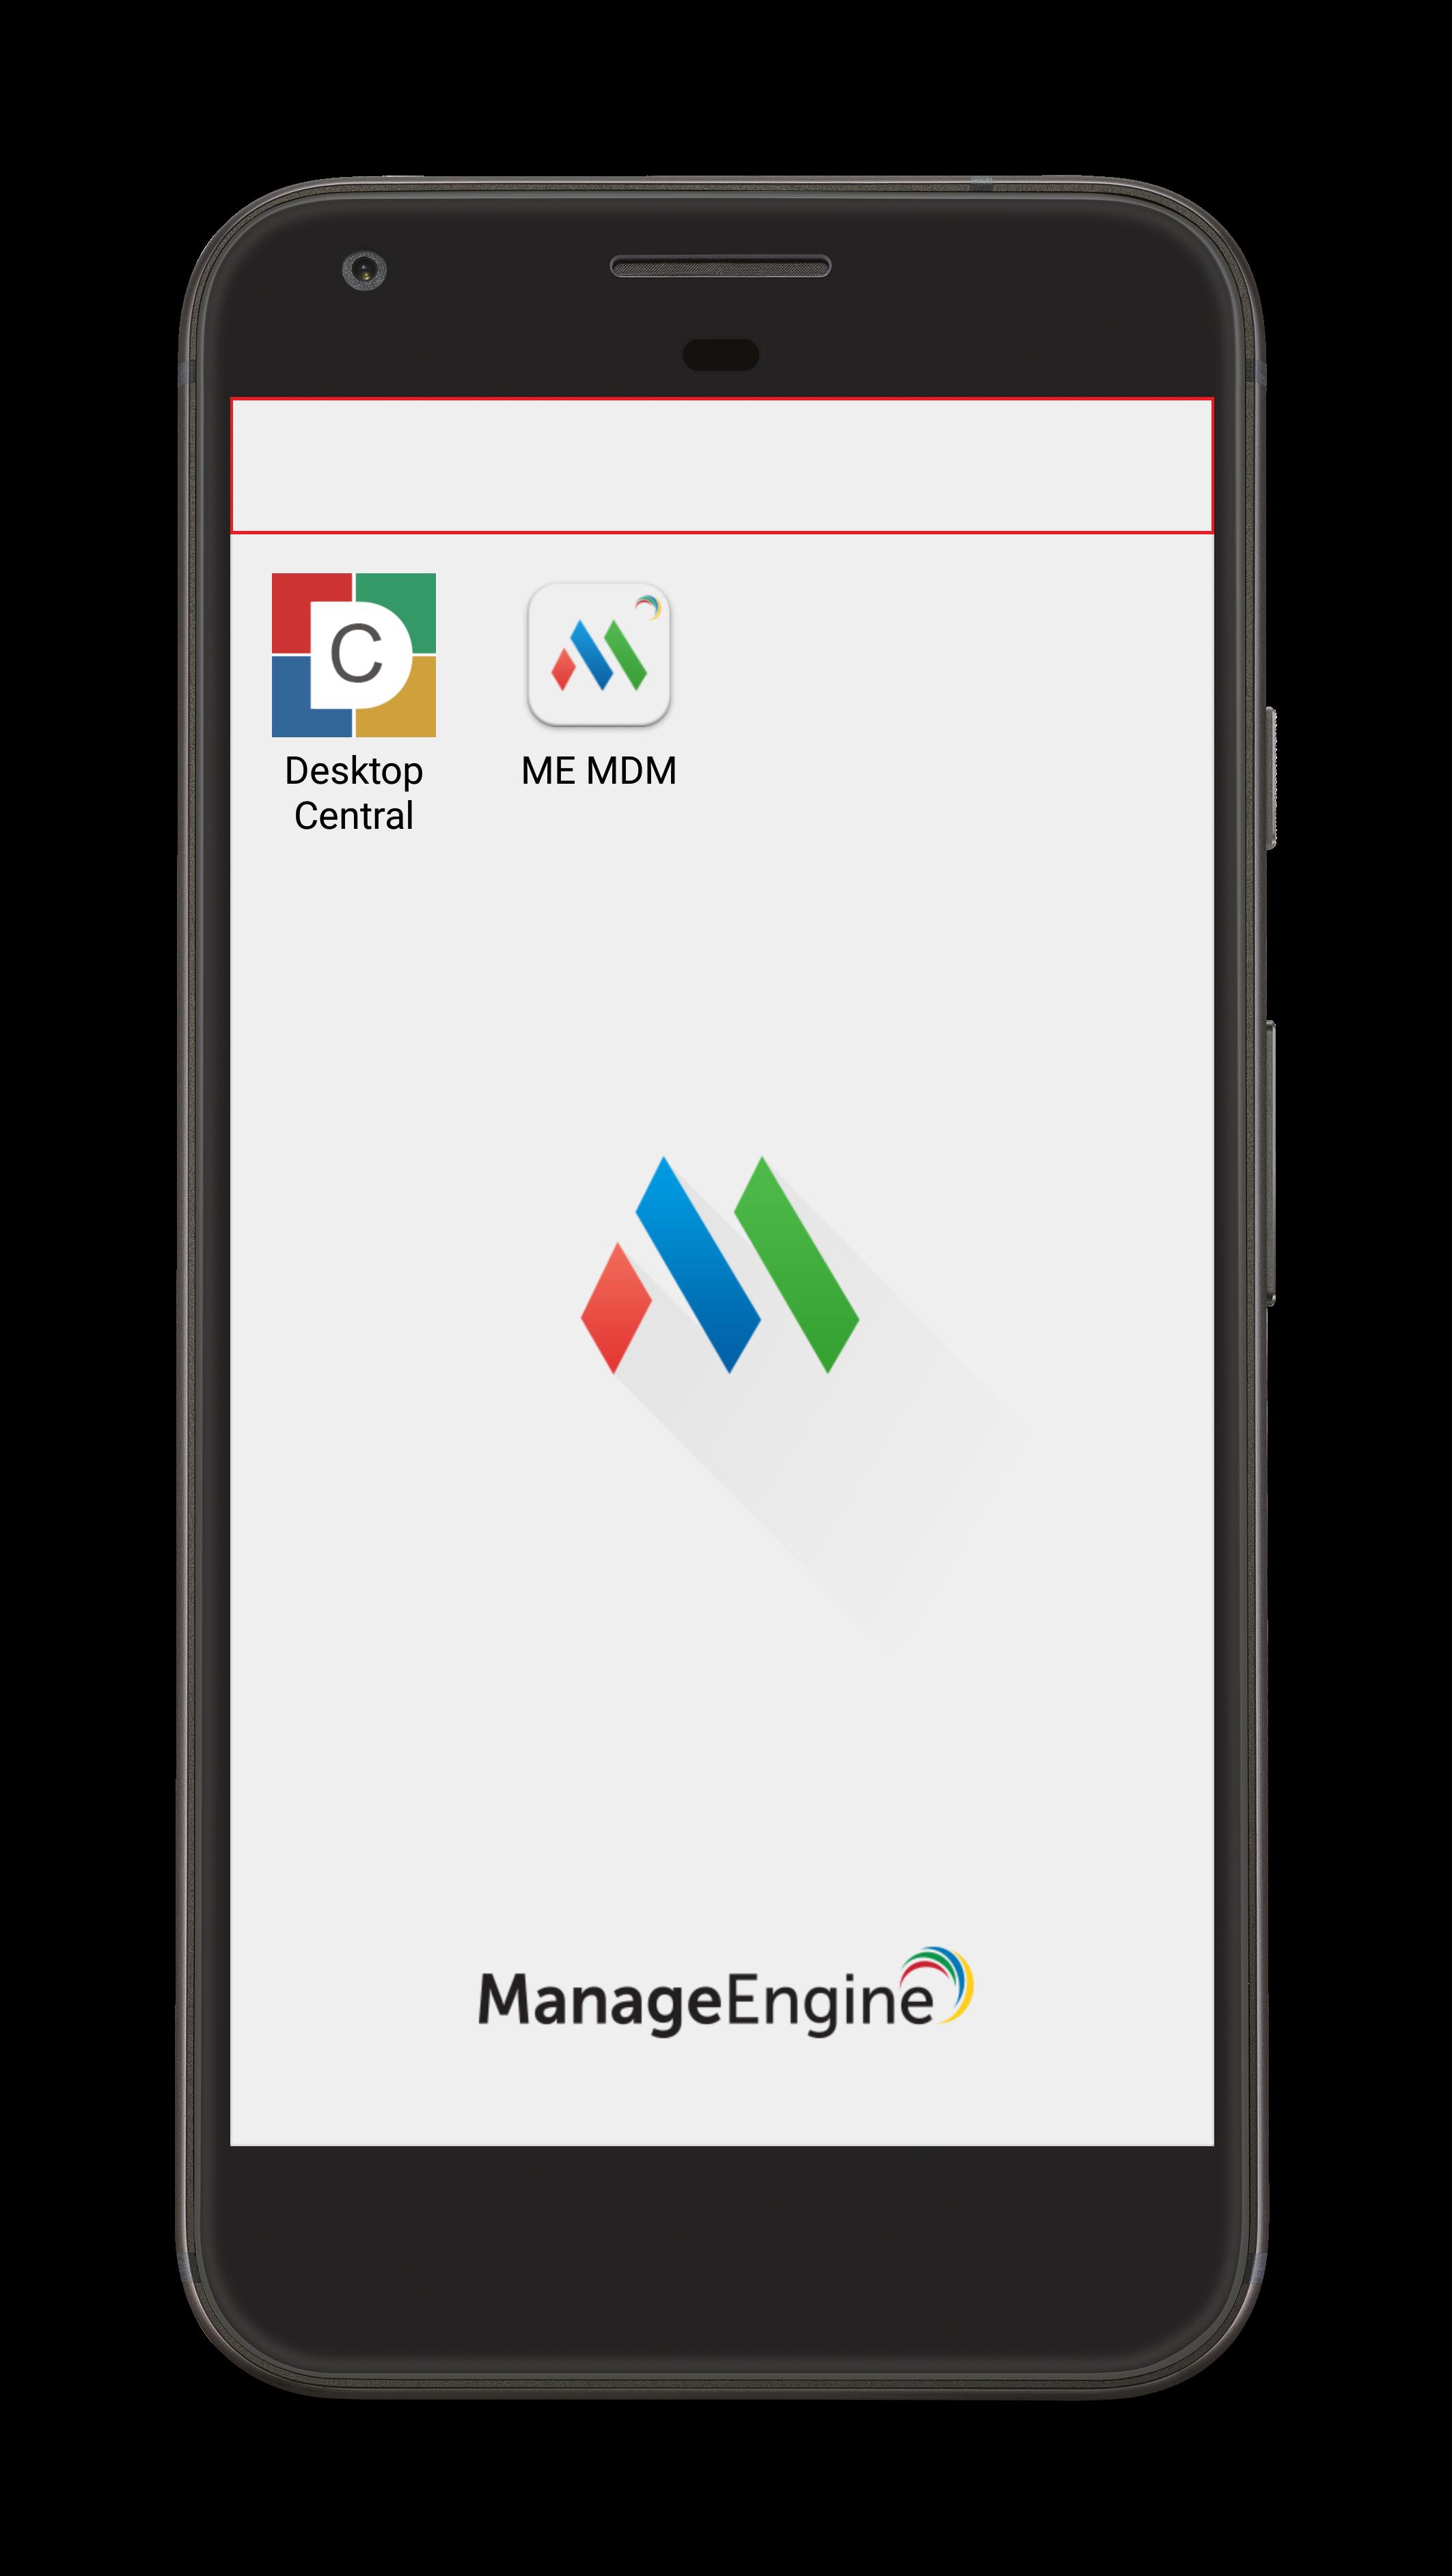 MDM as the Kiosk Software for Mult-app Kiosk Mode on Android device